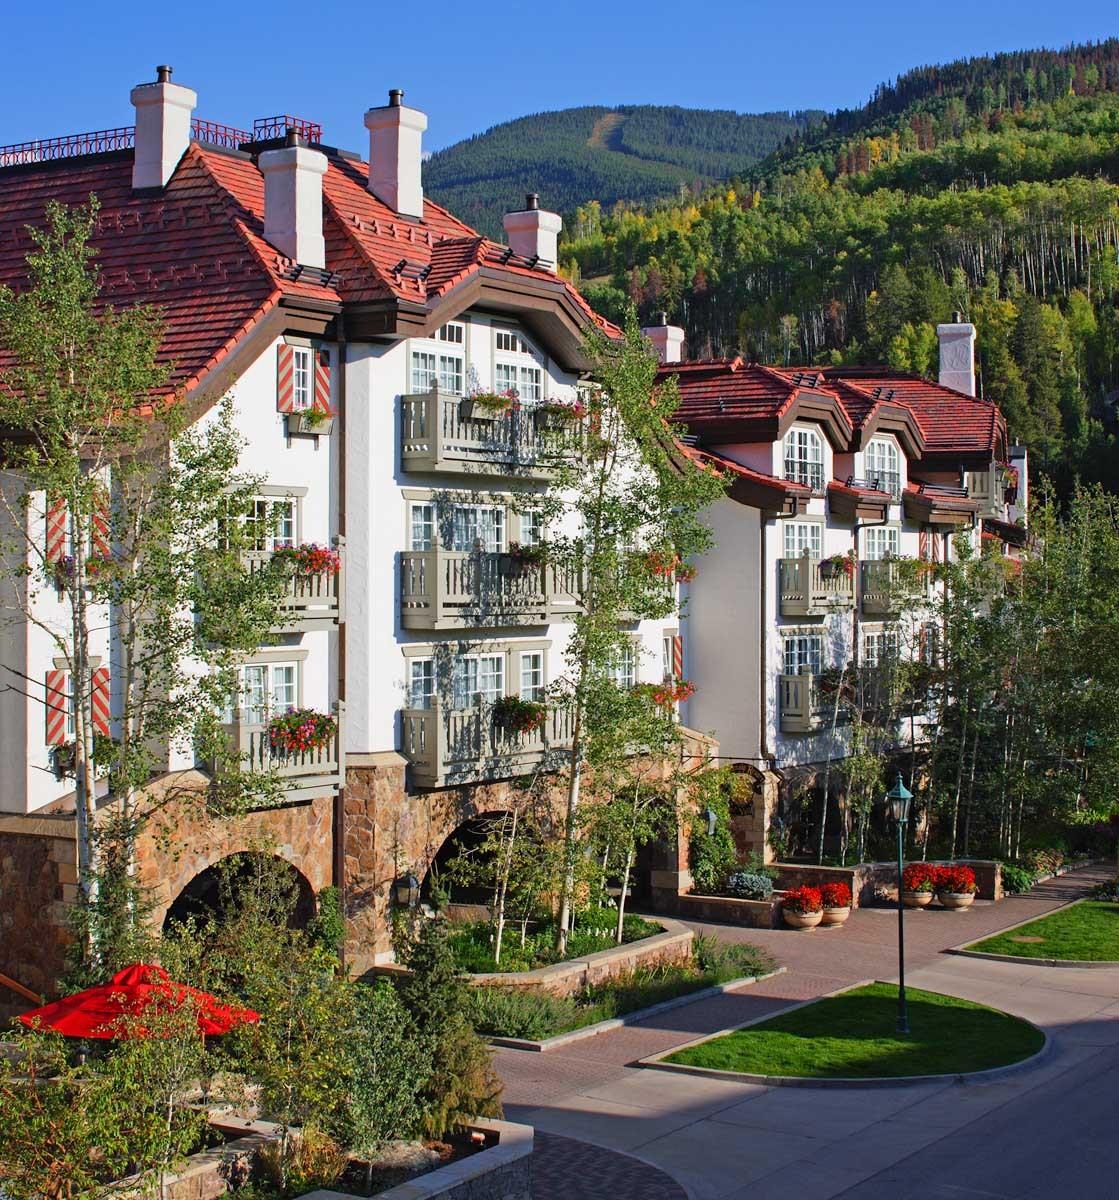 Sonnenalp Resort, Vail, Colorado